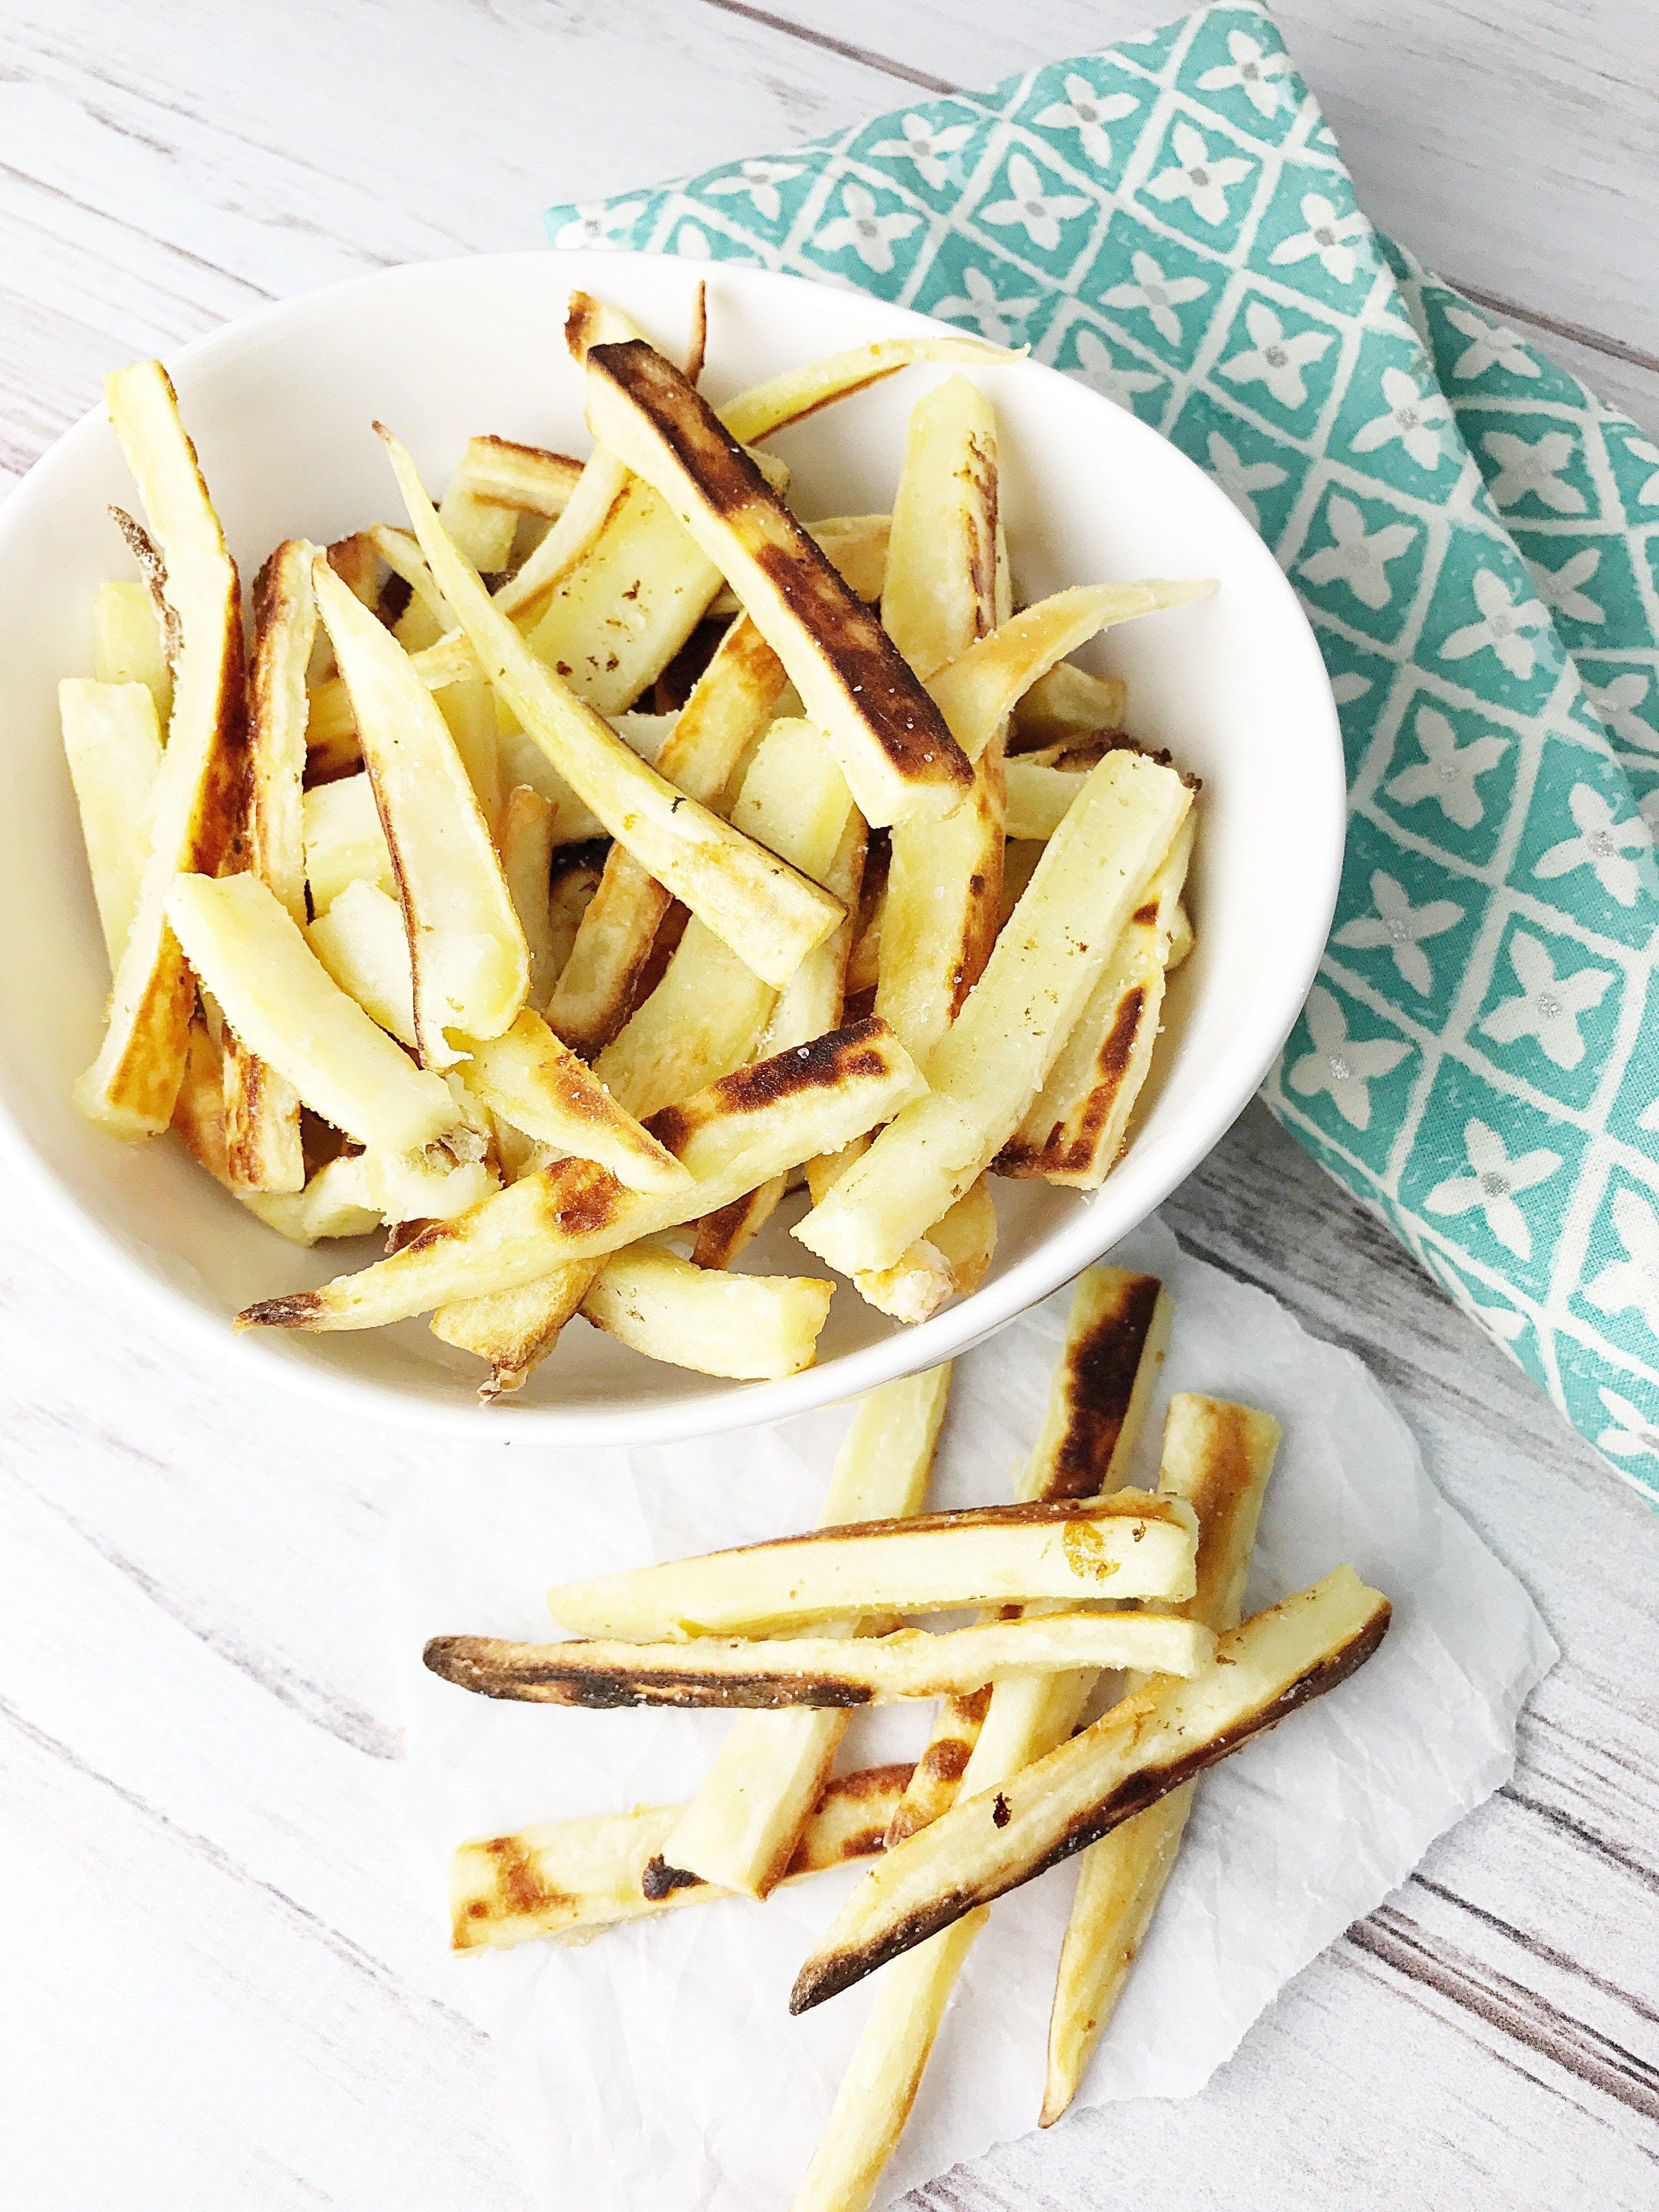 Baked White Sweet Potato Fries Kelly Lynn S Sweets And Treats Recipe Sweet Potato Fries Oven French Fries Sweet Potato,Elementary School Graduation Grad Gifts 2020